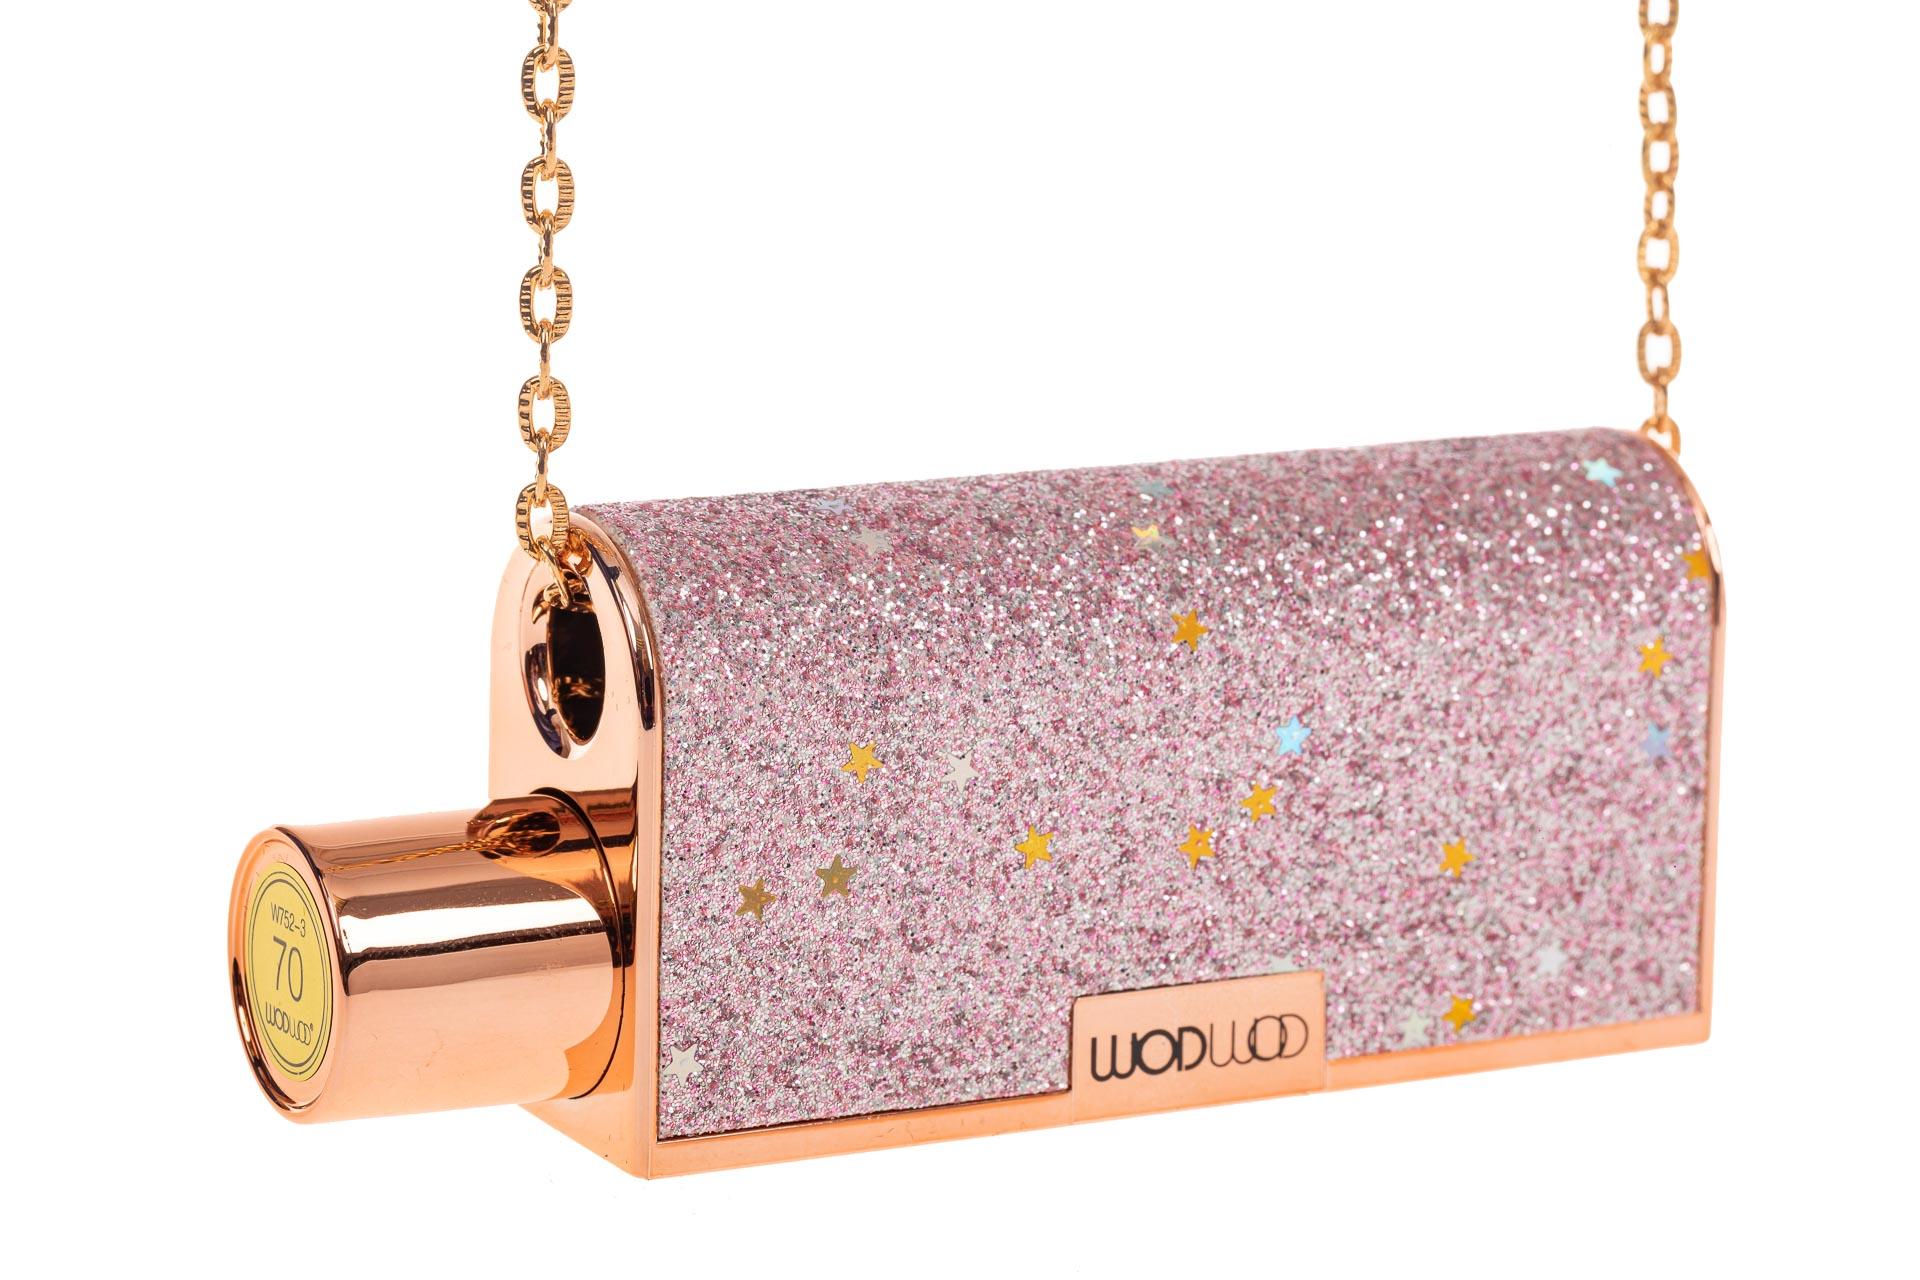 На фото 3 - Губная помада в виде сумочки, цвет розовый, оттенок №70